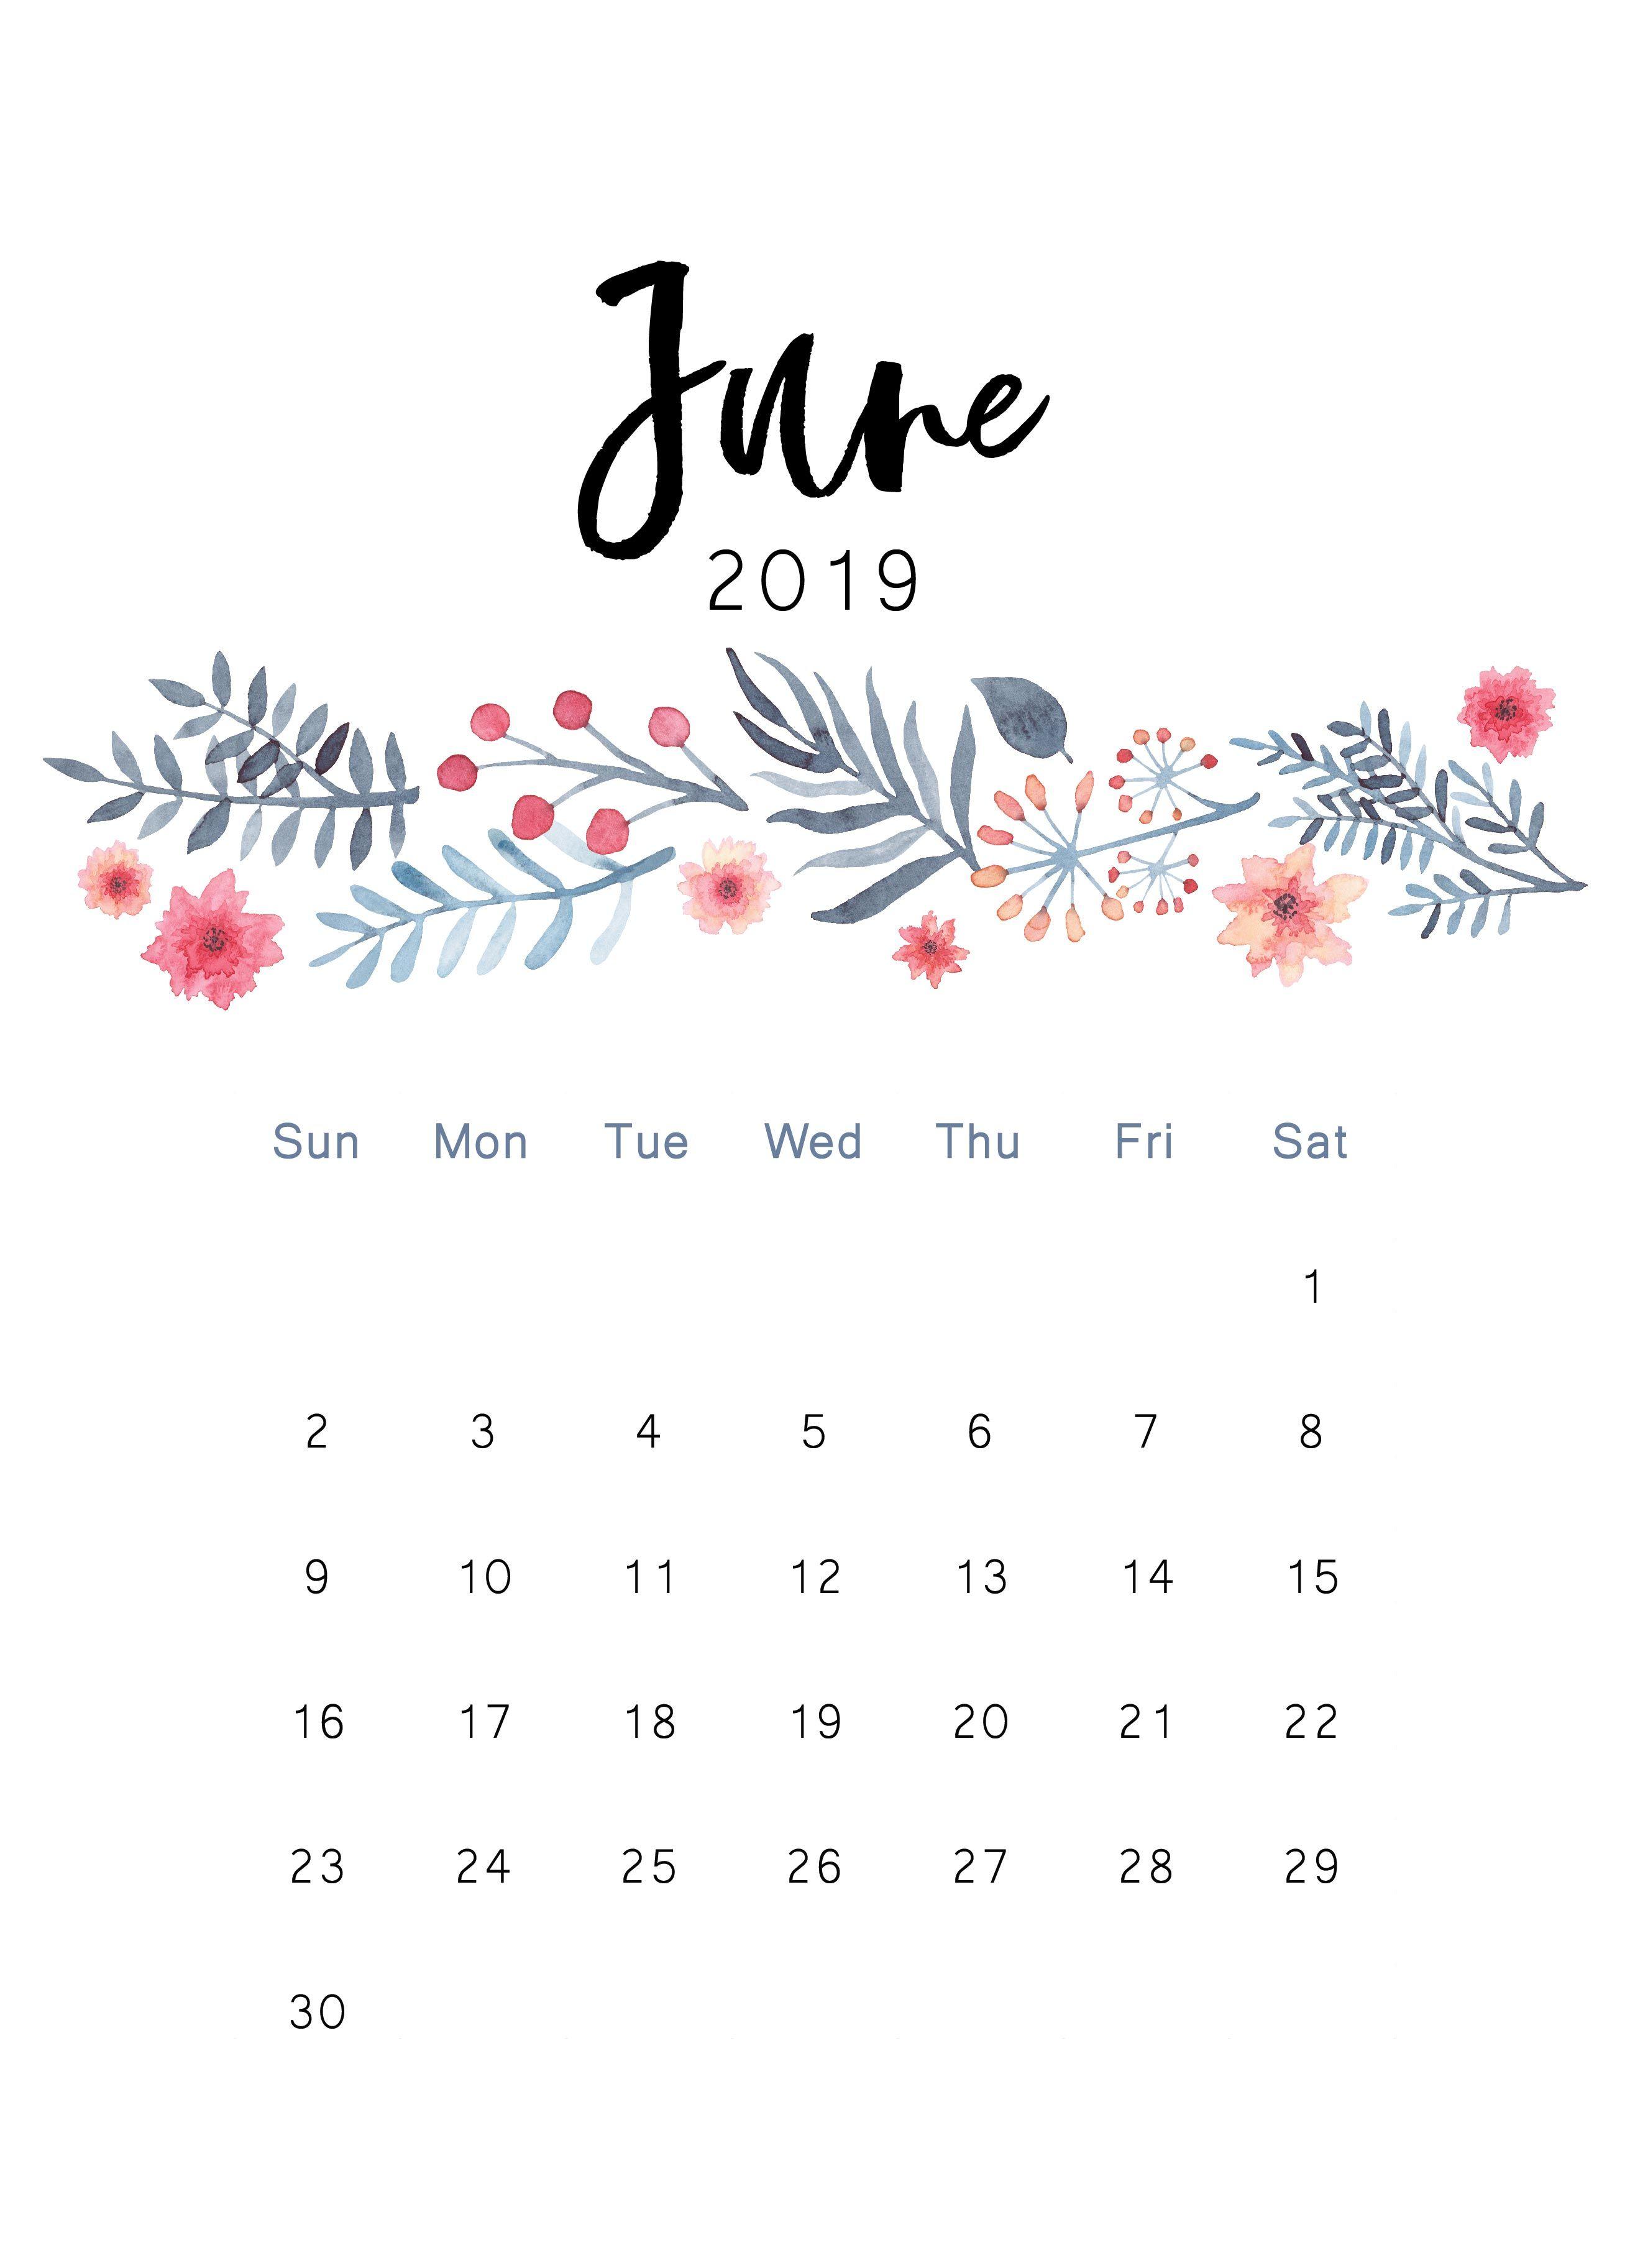 Free 2019 Printable Calendar The Cactus Creative June